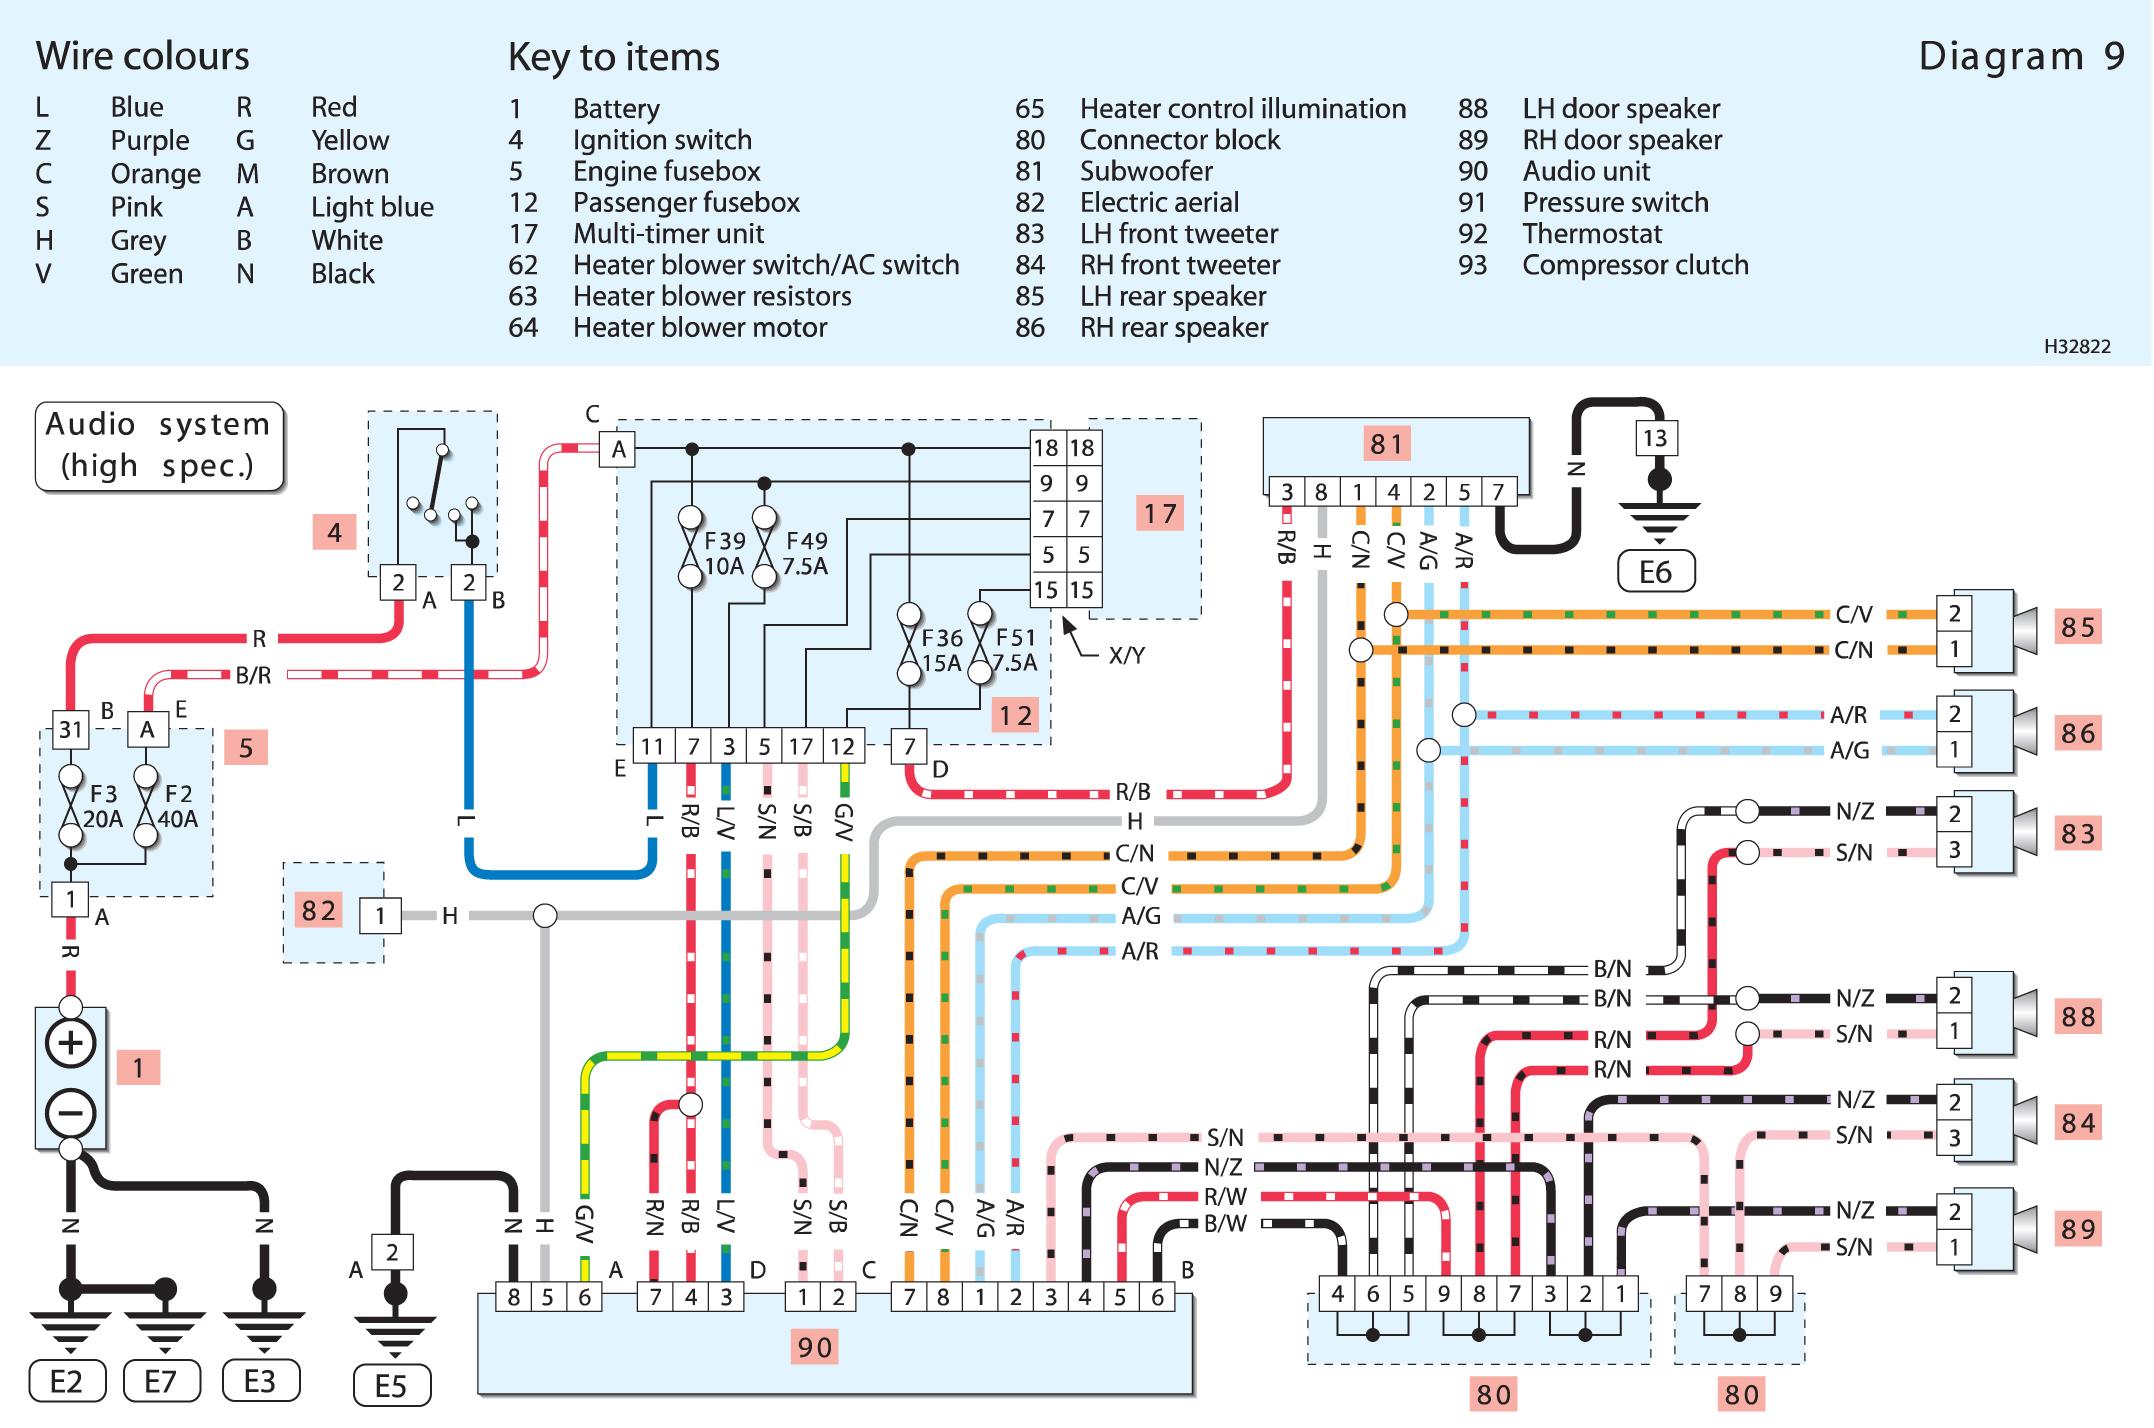 medium resolution of fiat uno wiring diagram electrical wiring diagrams amphicar wiring diagram fiat stilo wiring diagrams